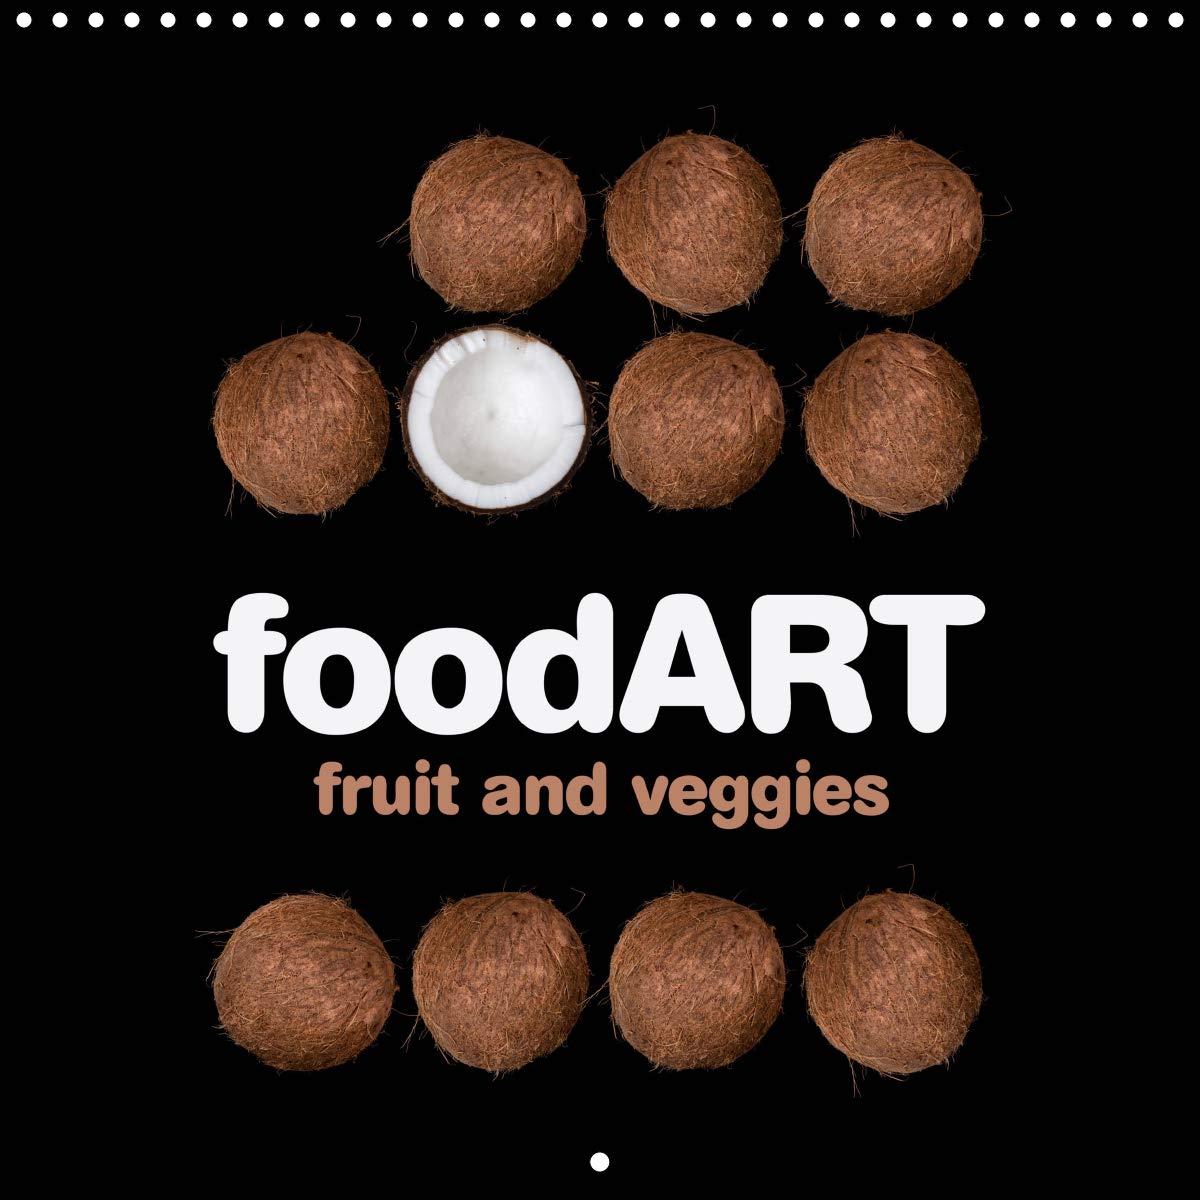 FoodART Fruit And Veggies  Wall Calendar 2020 300 × 300 Mm Square